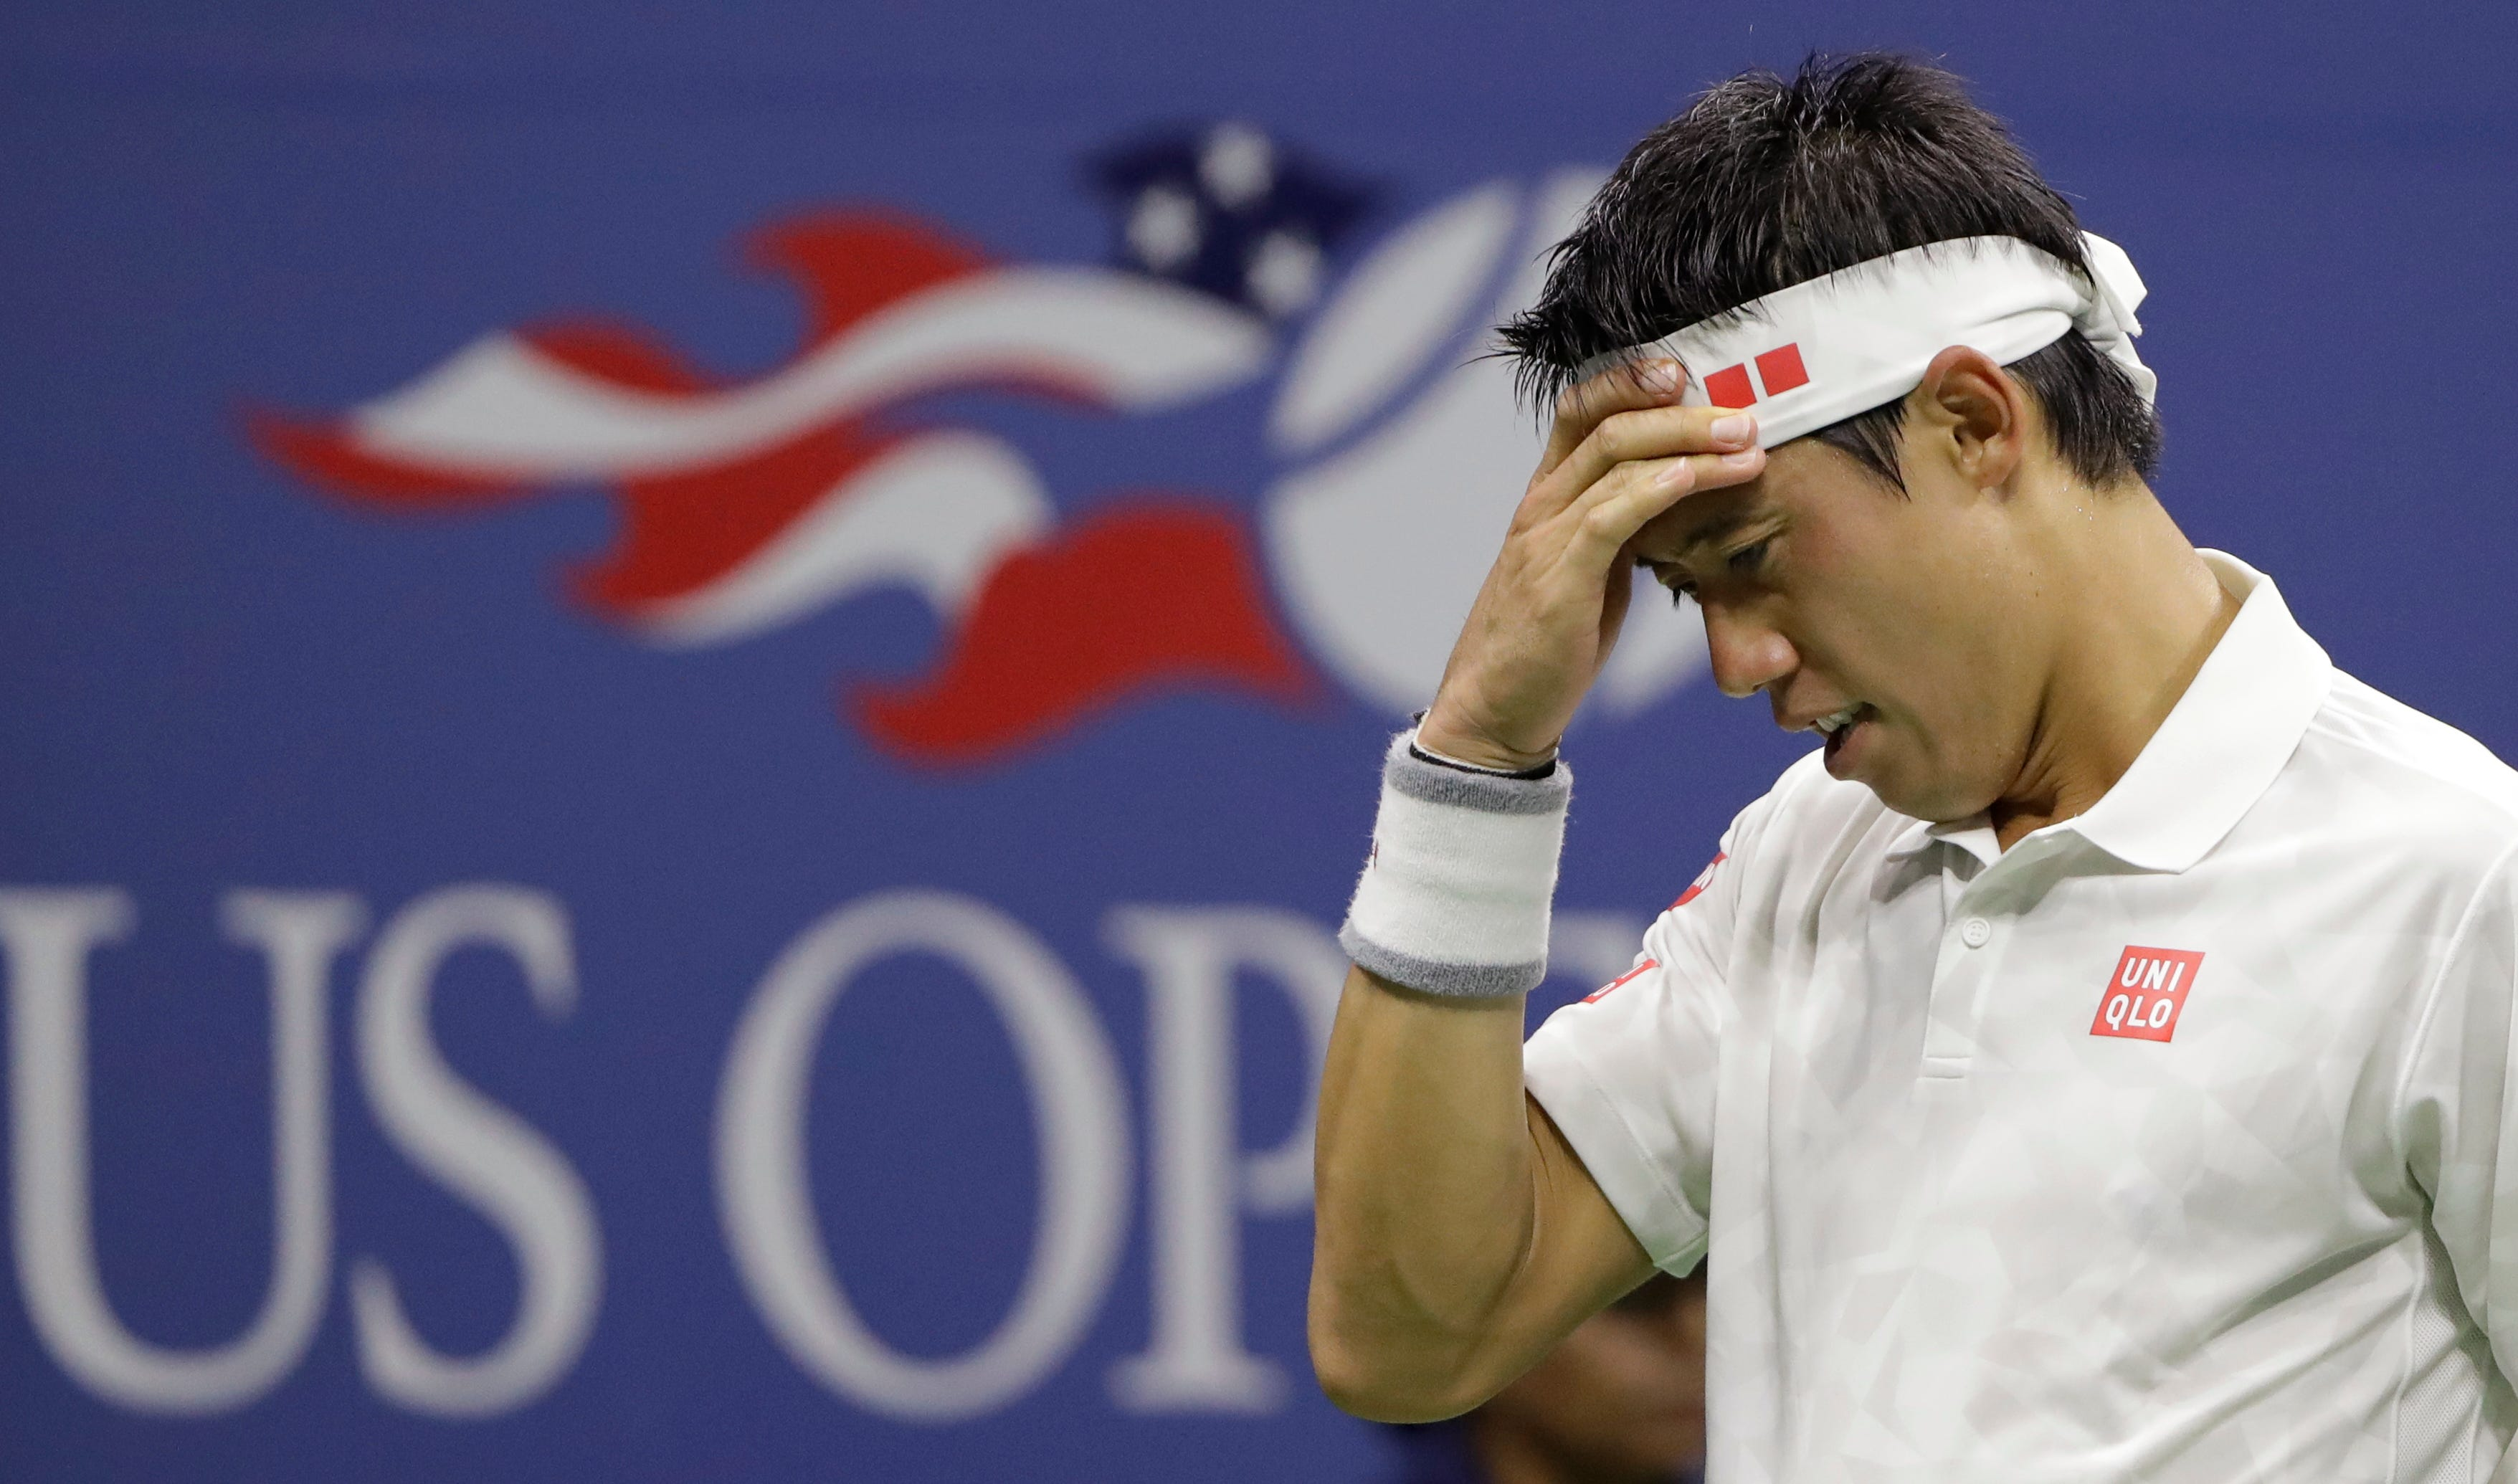 2014 U.S. Open runner-up Kei Nishikori latest to pull out of U.S. Open